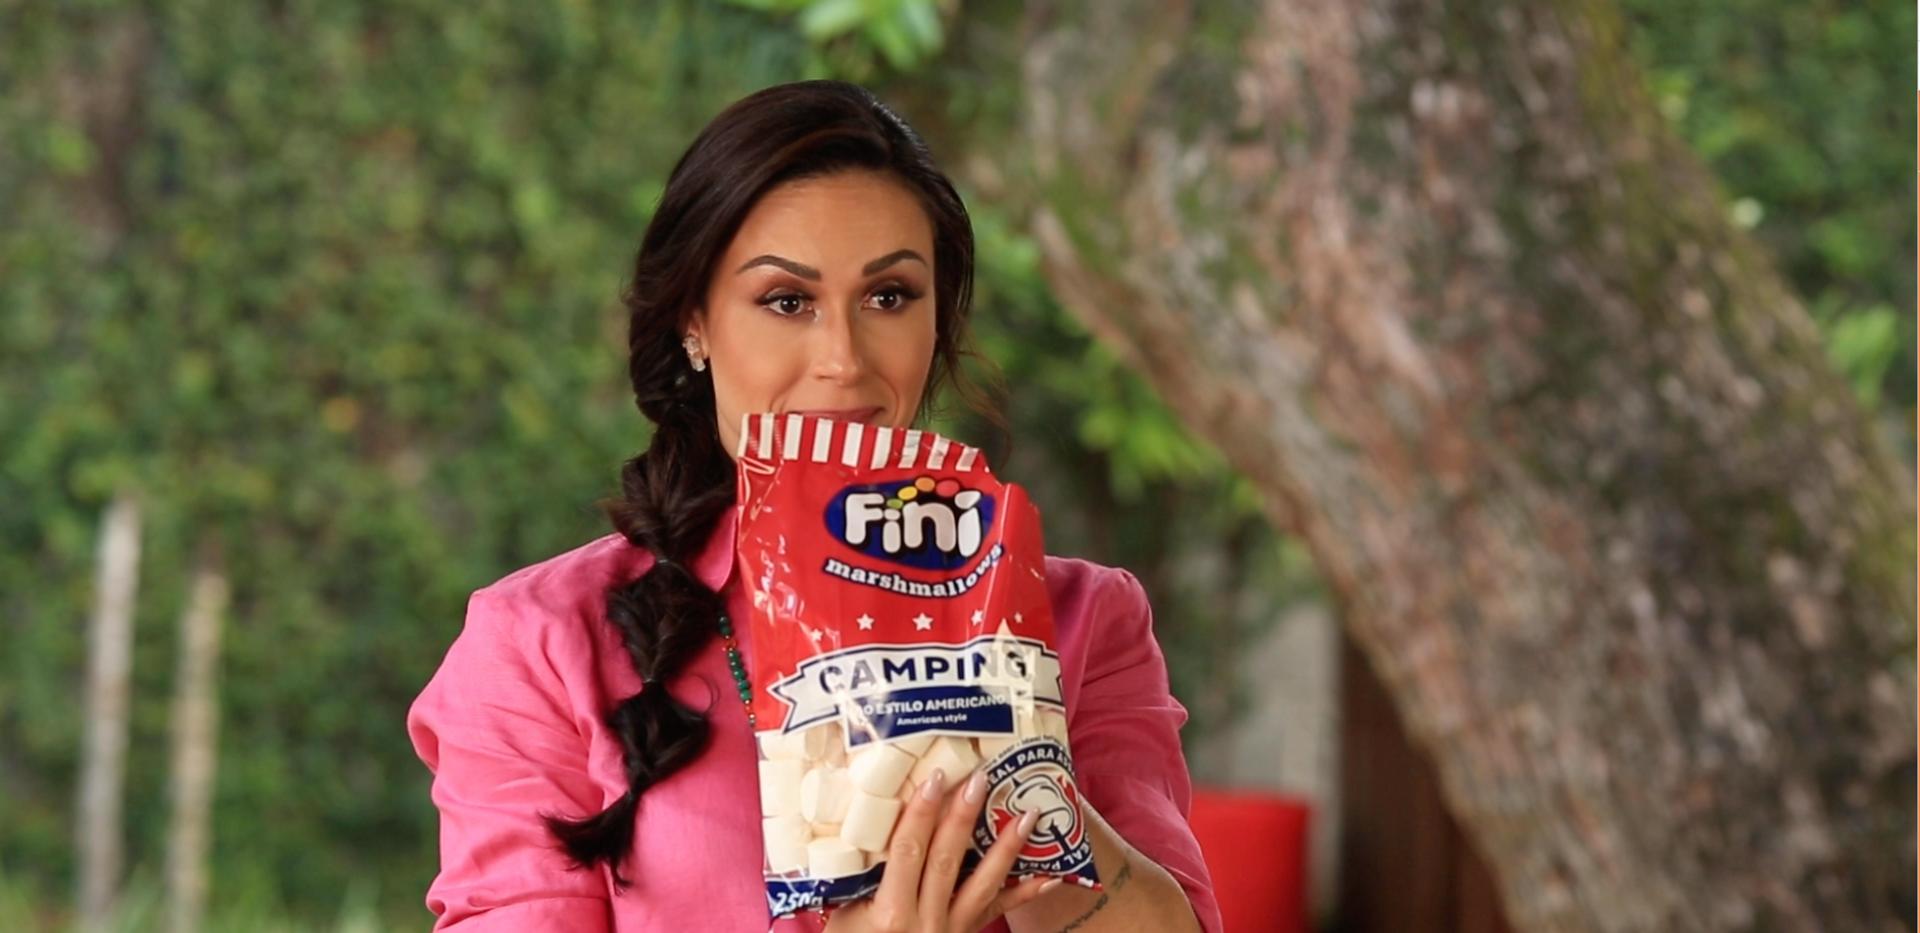 Nadja Haddad para Fini_marshmallow